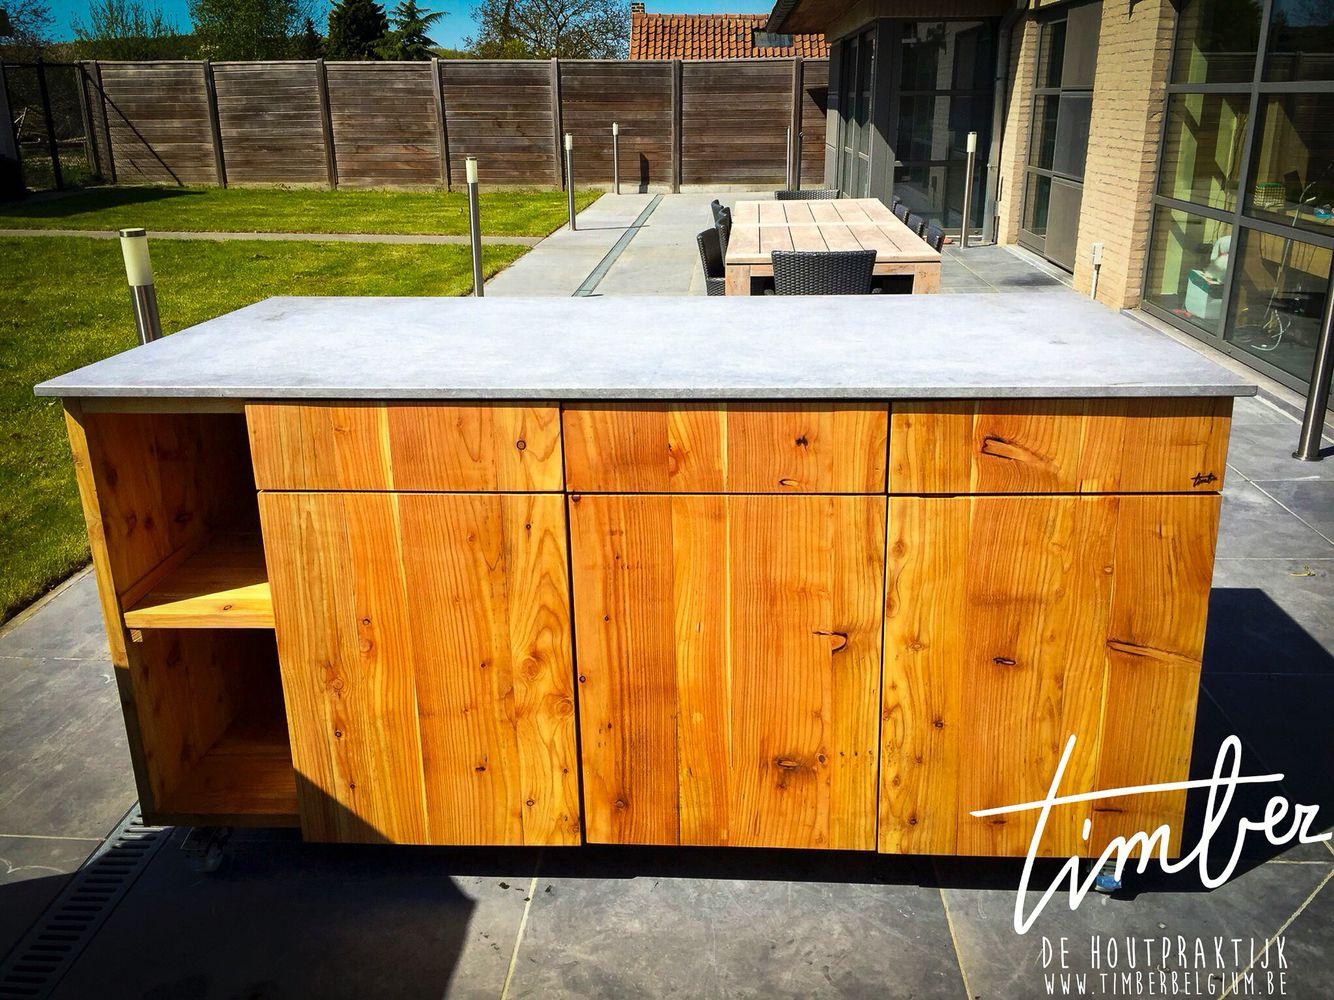 #OutOfOfficeIsland outdoor Kitchen by Timber - De Houtpraktijk. www.timberbelgium.be